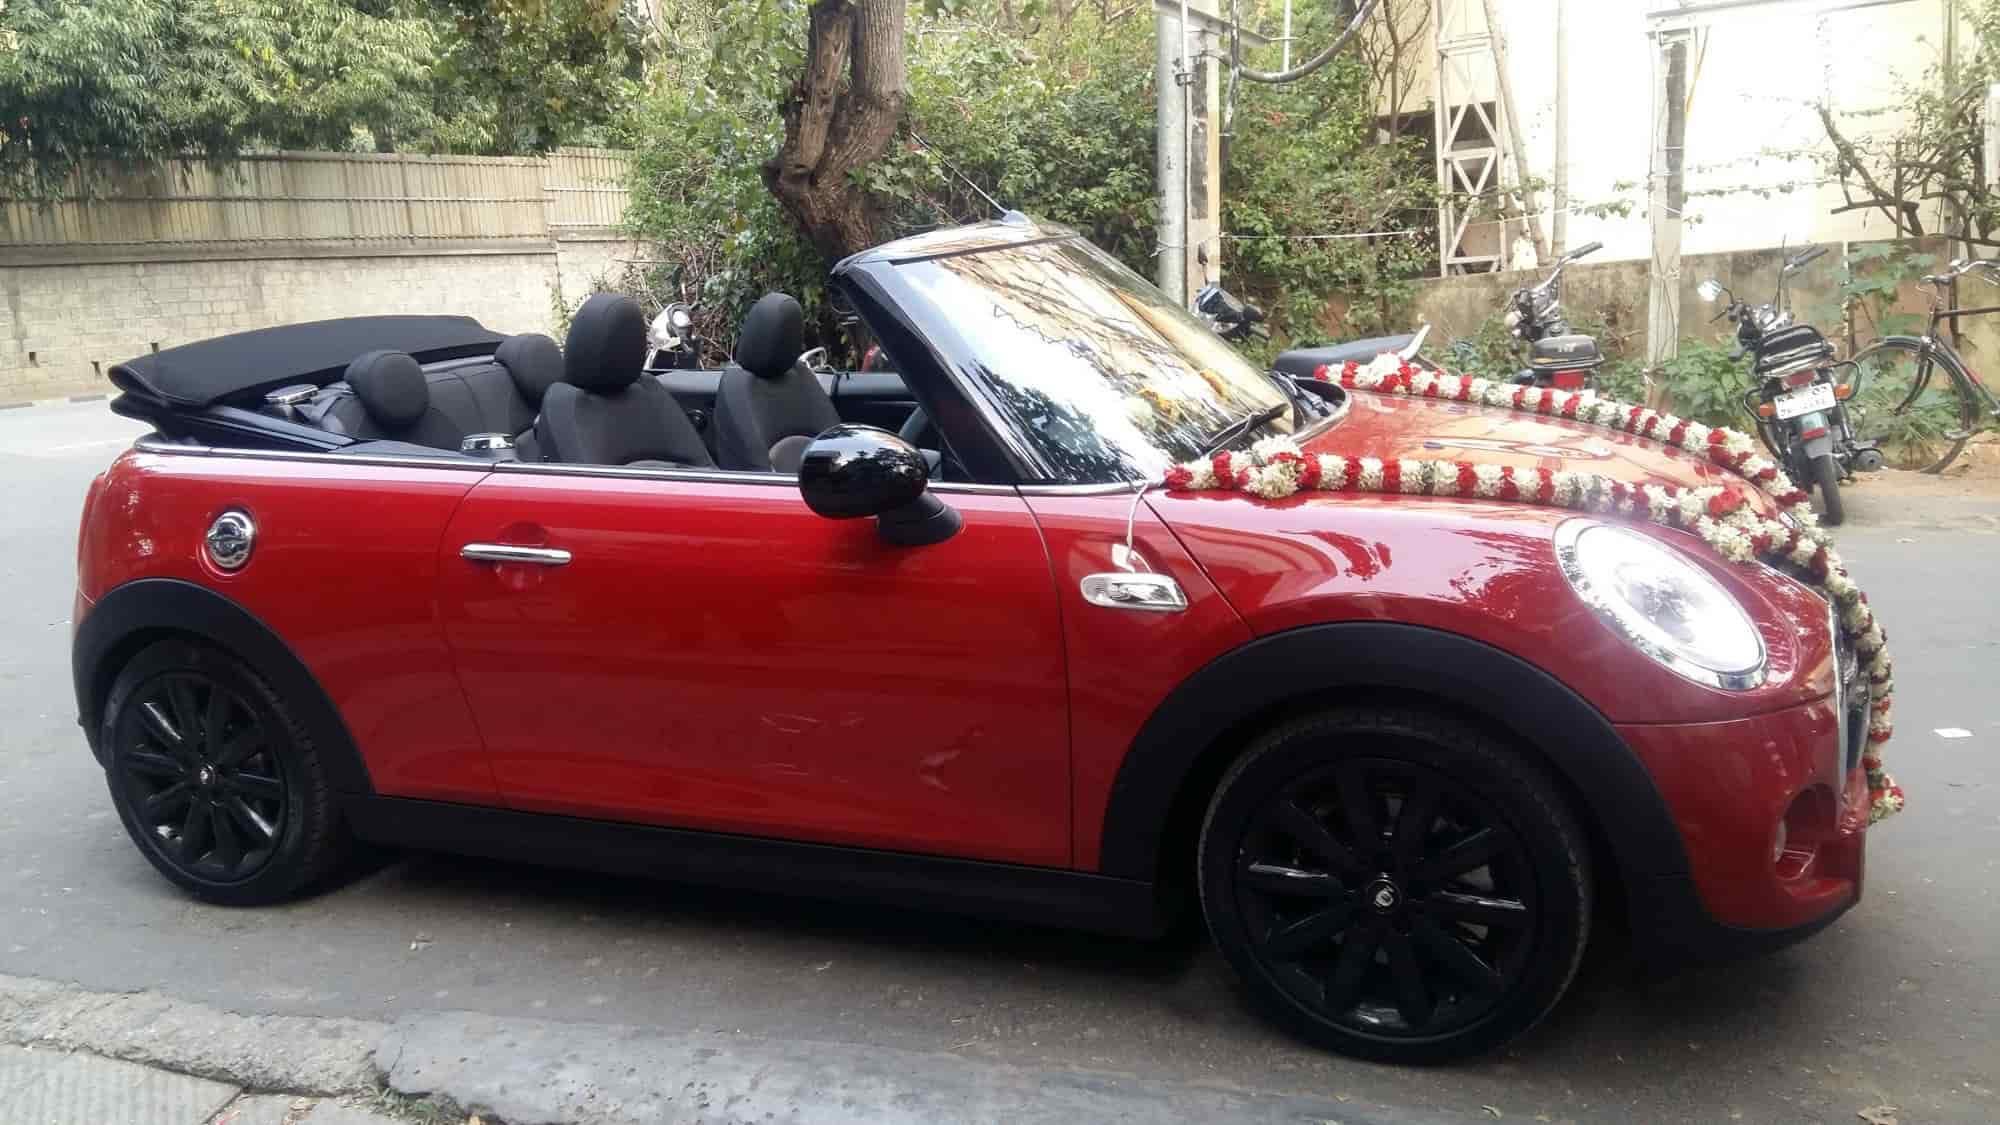 Zoom Car Modify Photos Rajarajeshwari Nagar Bangalore Pictures